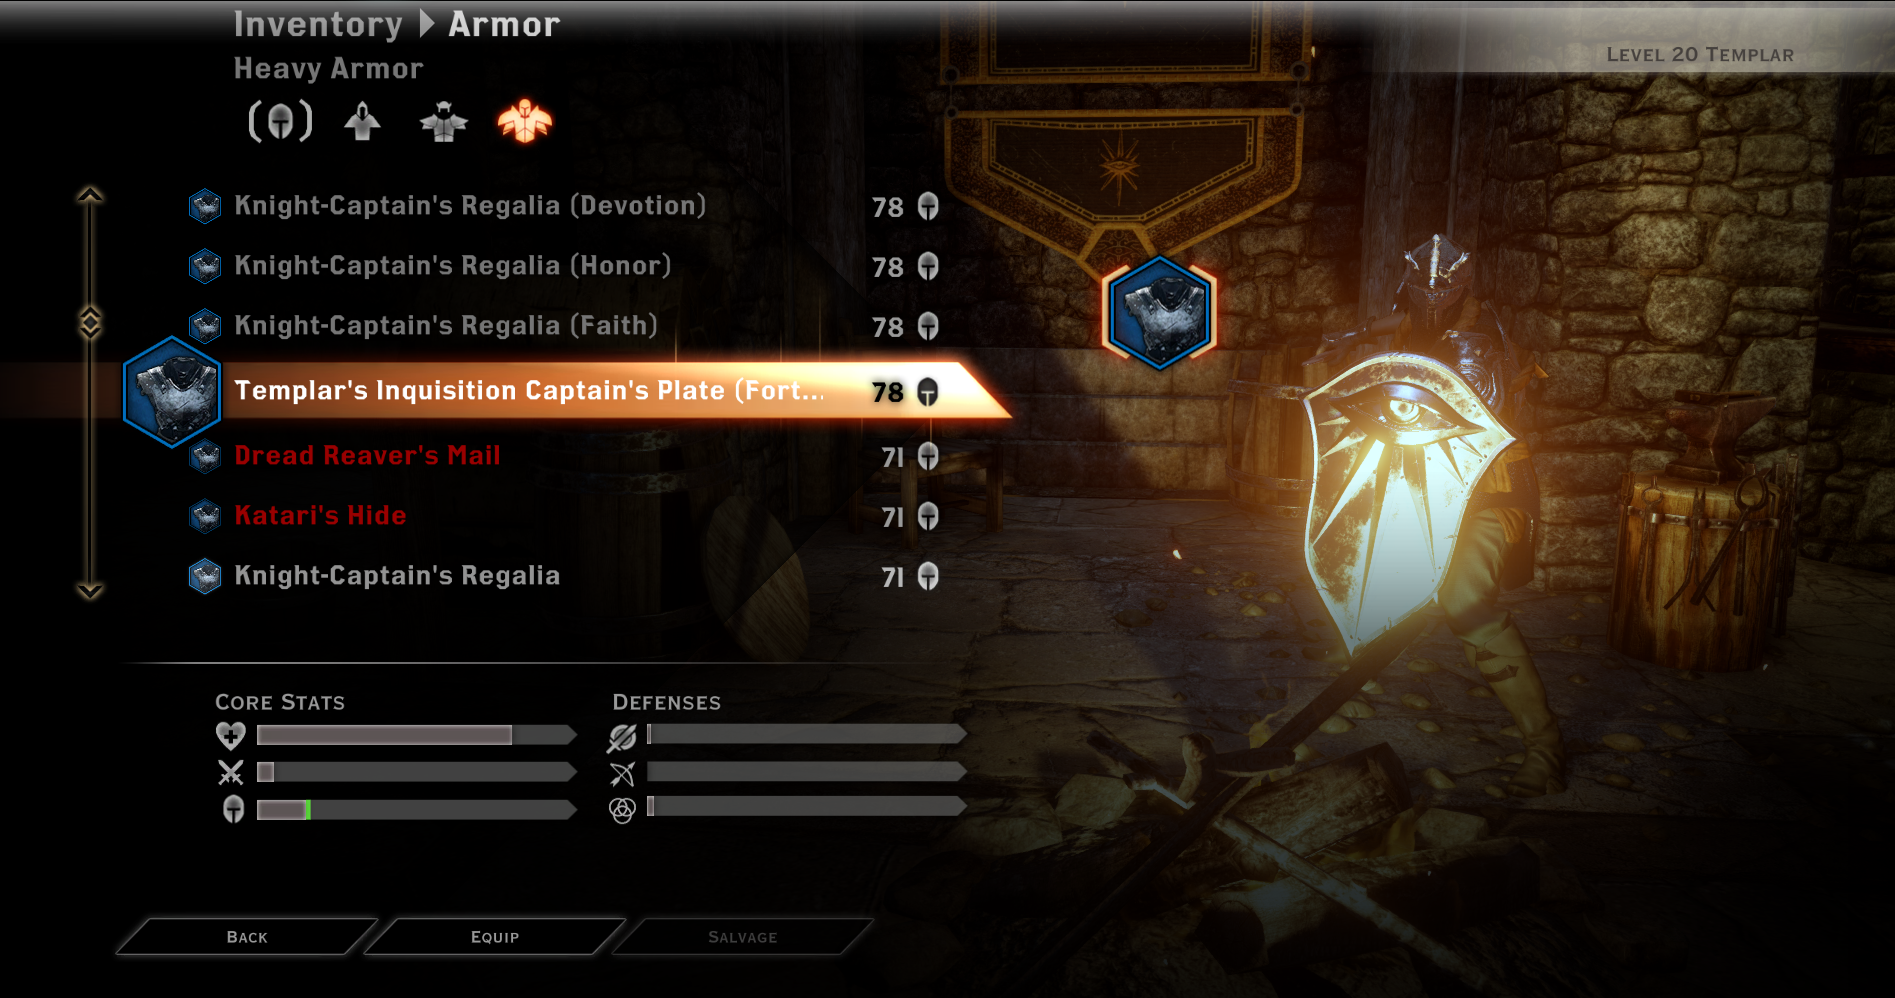 Multiplayer armor | Dragon Age Wiki | FANDOM powered by Wikia